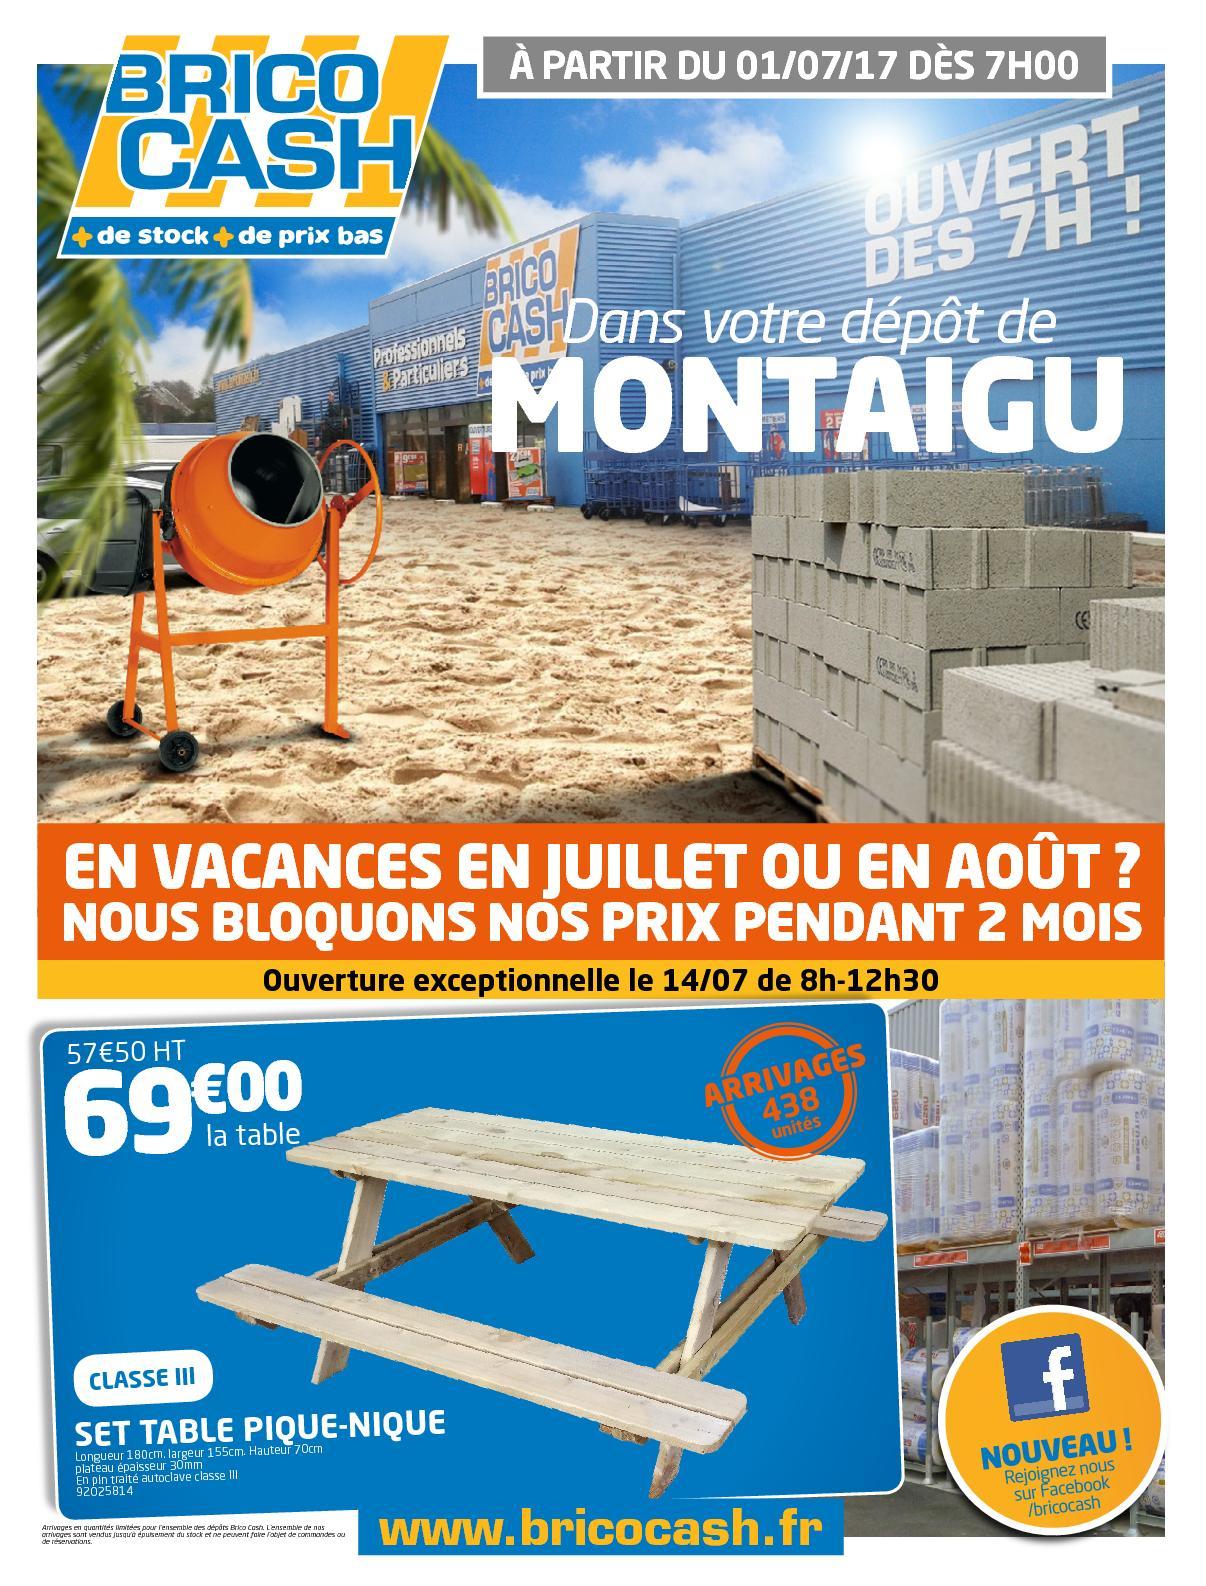 Calaméo - Catalogue Brico Cash Été 2017 tout Regard Beton 50X50 Brico Depot